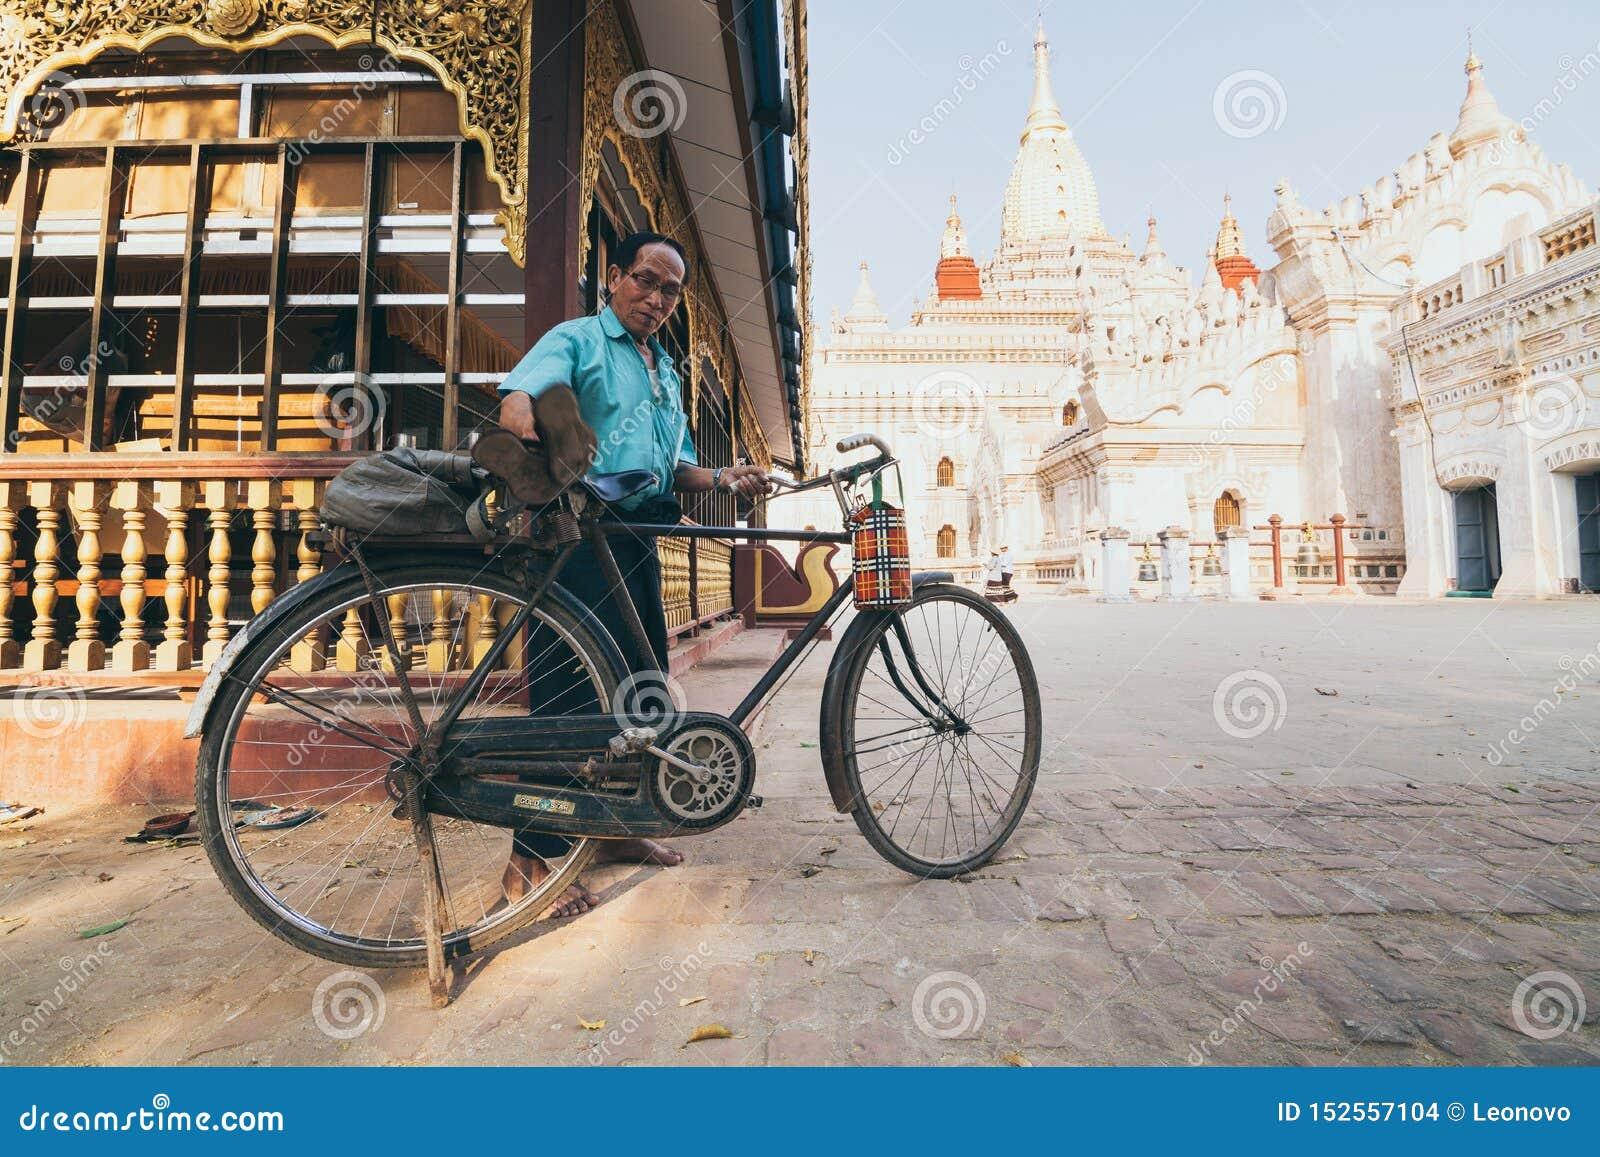 Bagan, Myanmar - March 2019: Burmese man parking bicycle in the backyard of Ananda temple